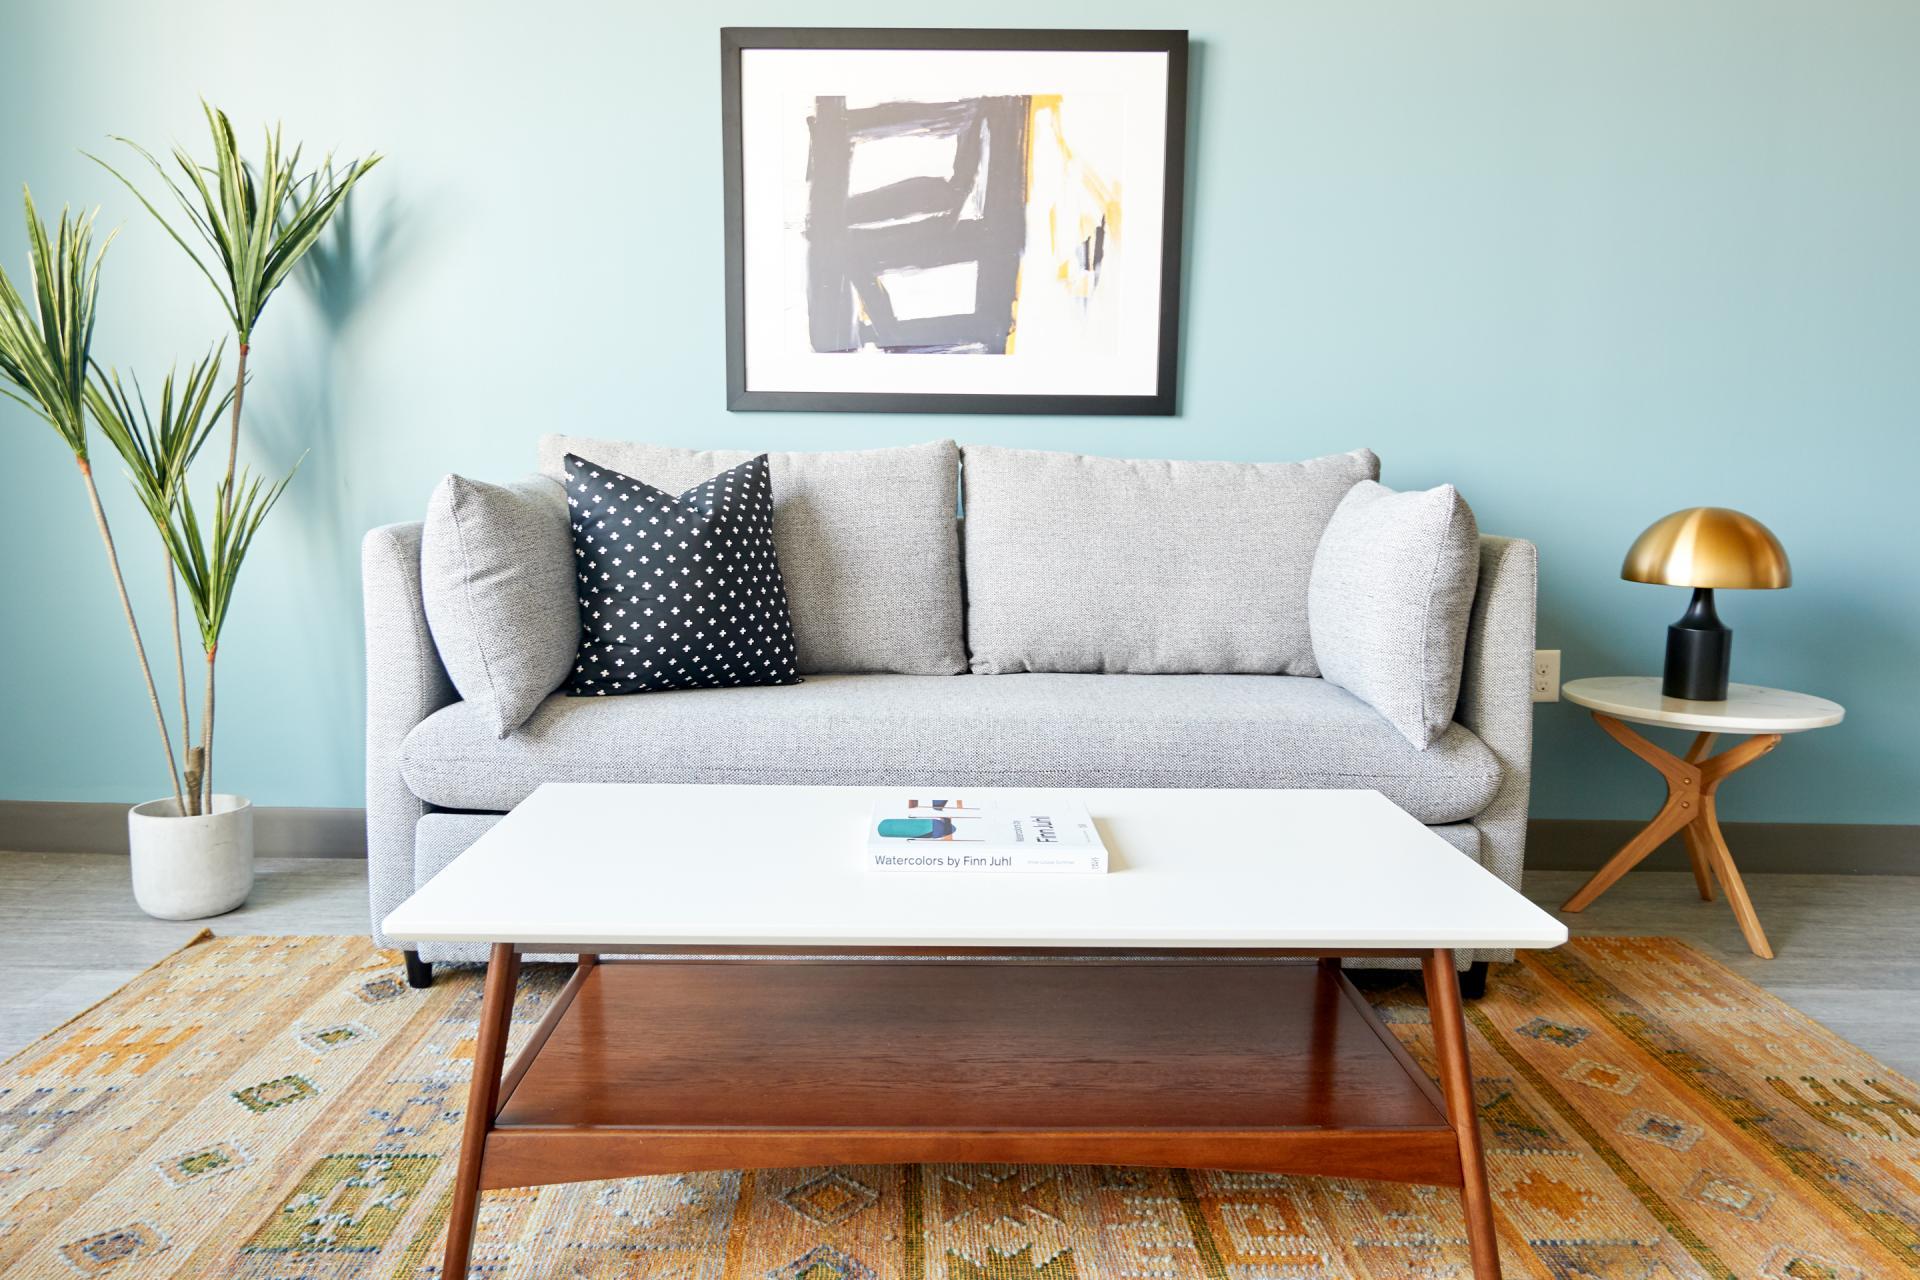 Sofa at McKinley Apartments, Center, Phoenix